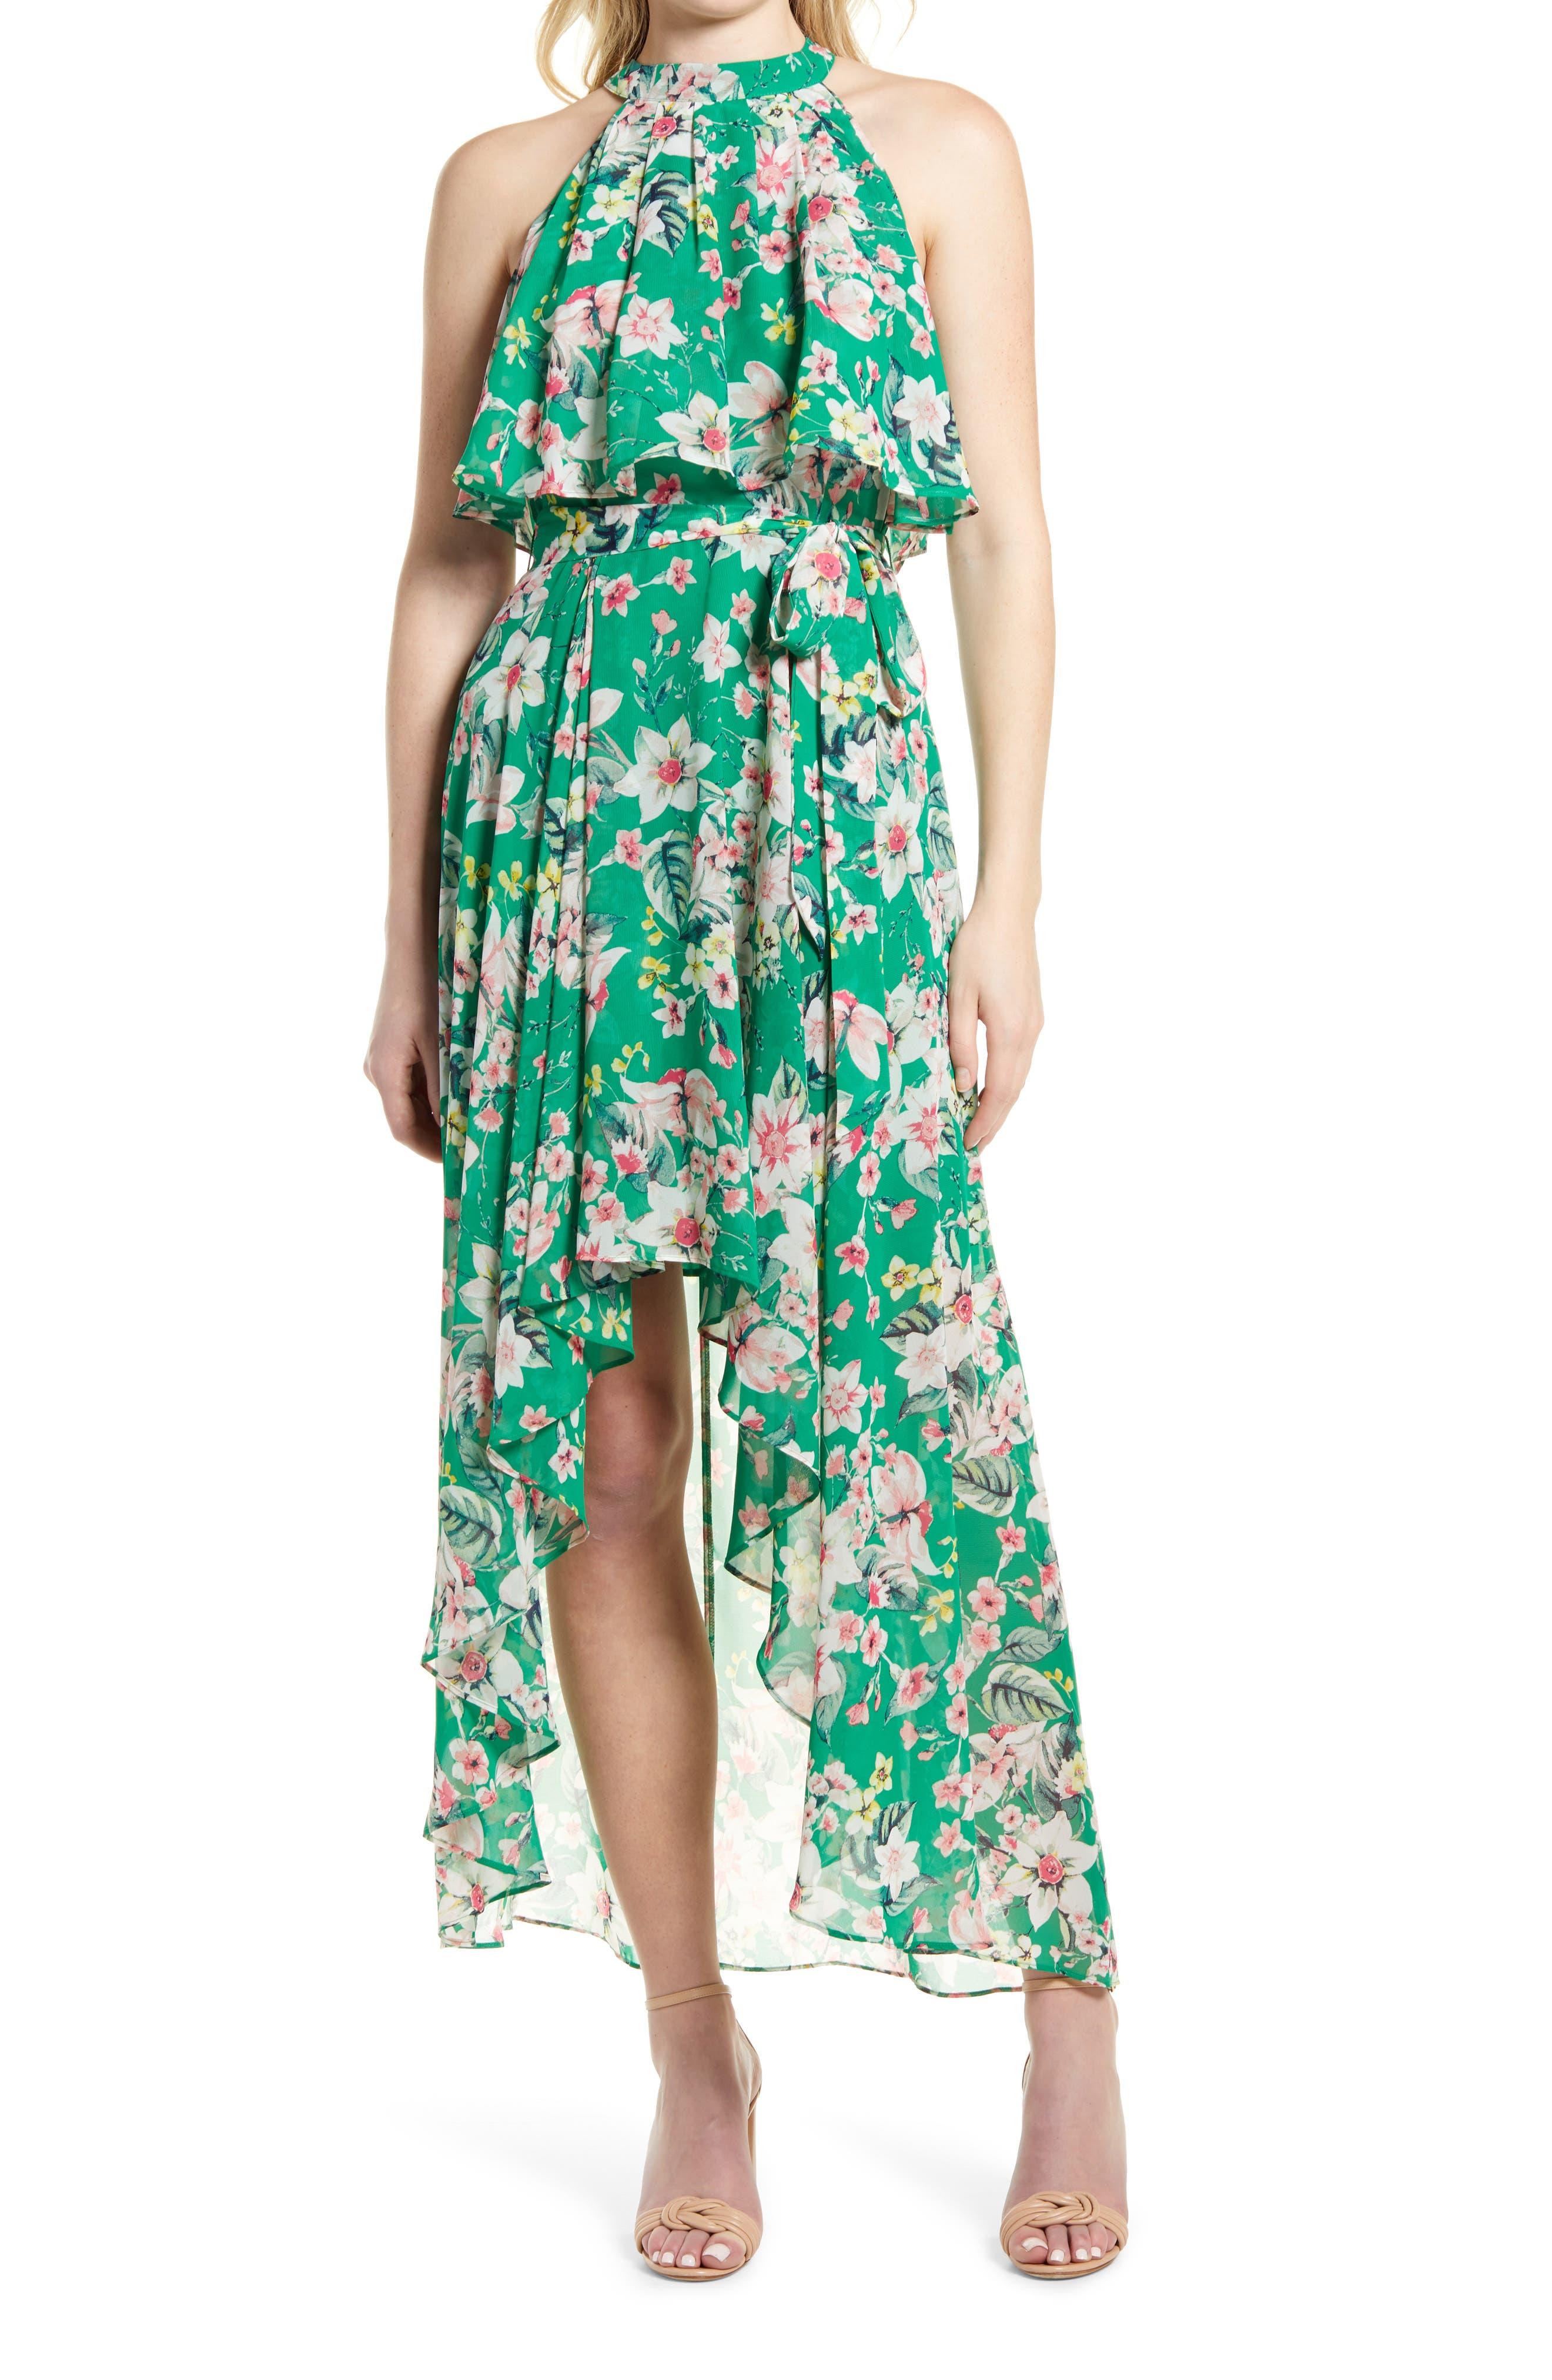 Floral Halter Neck Popover Chiffon Dress